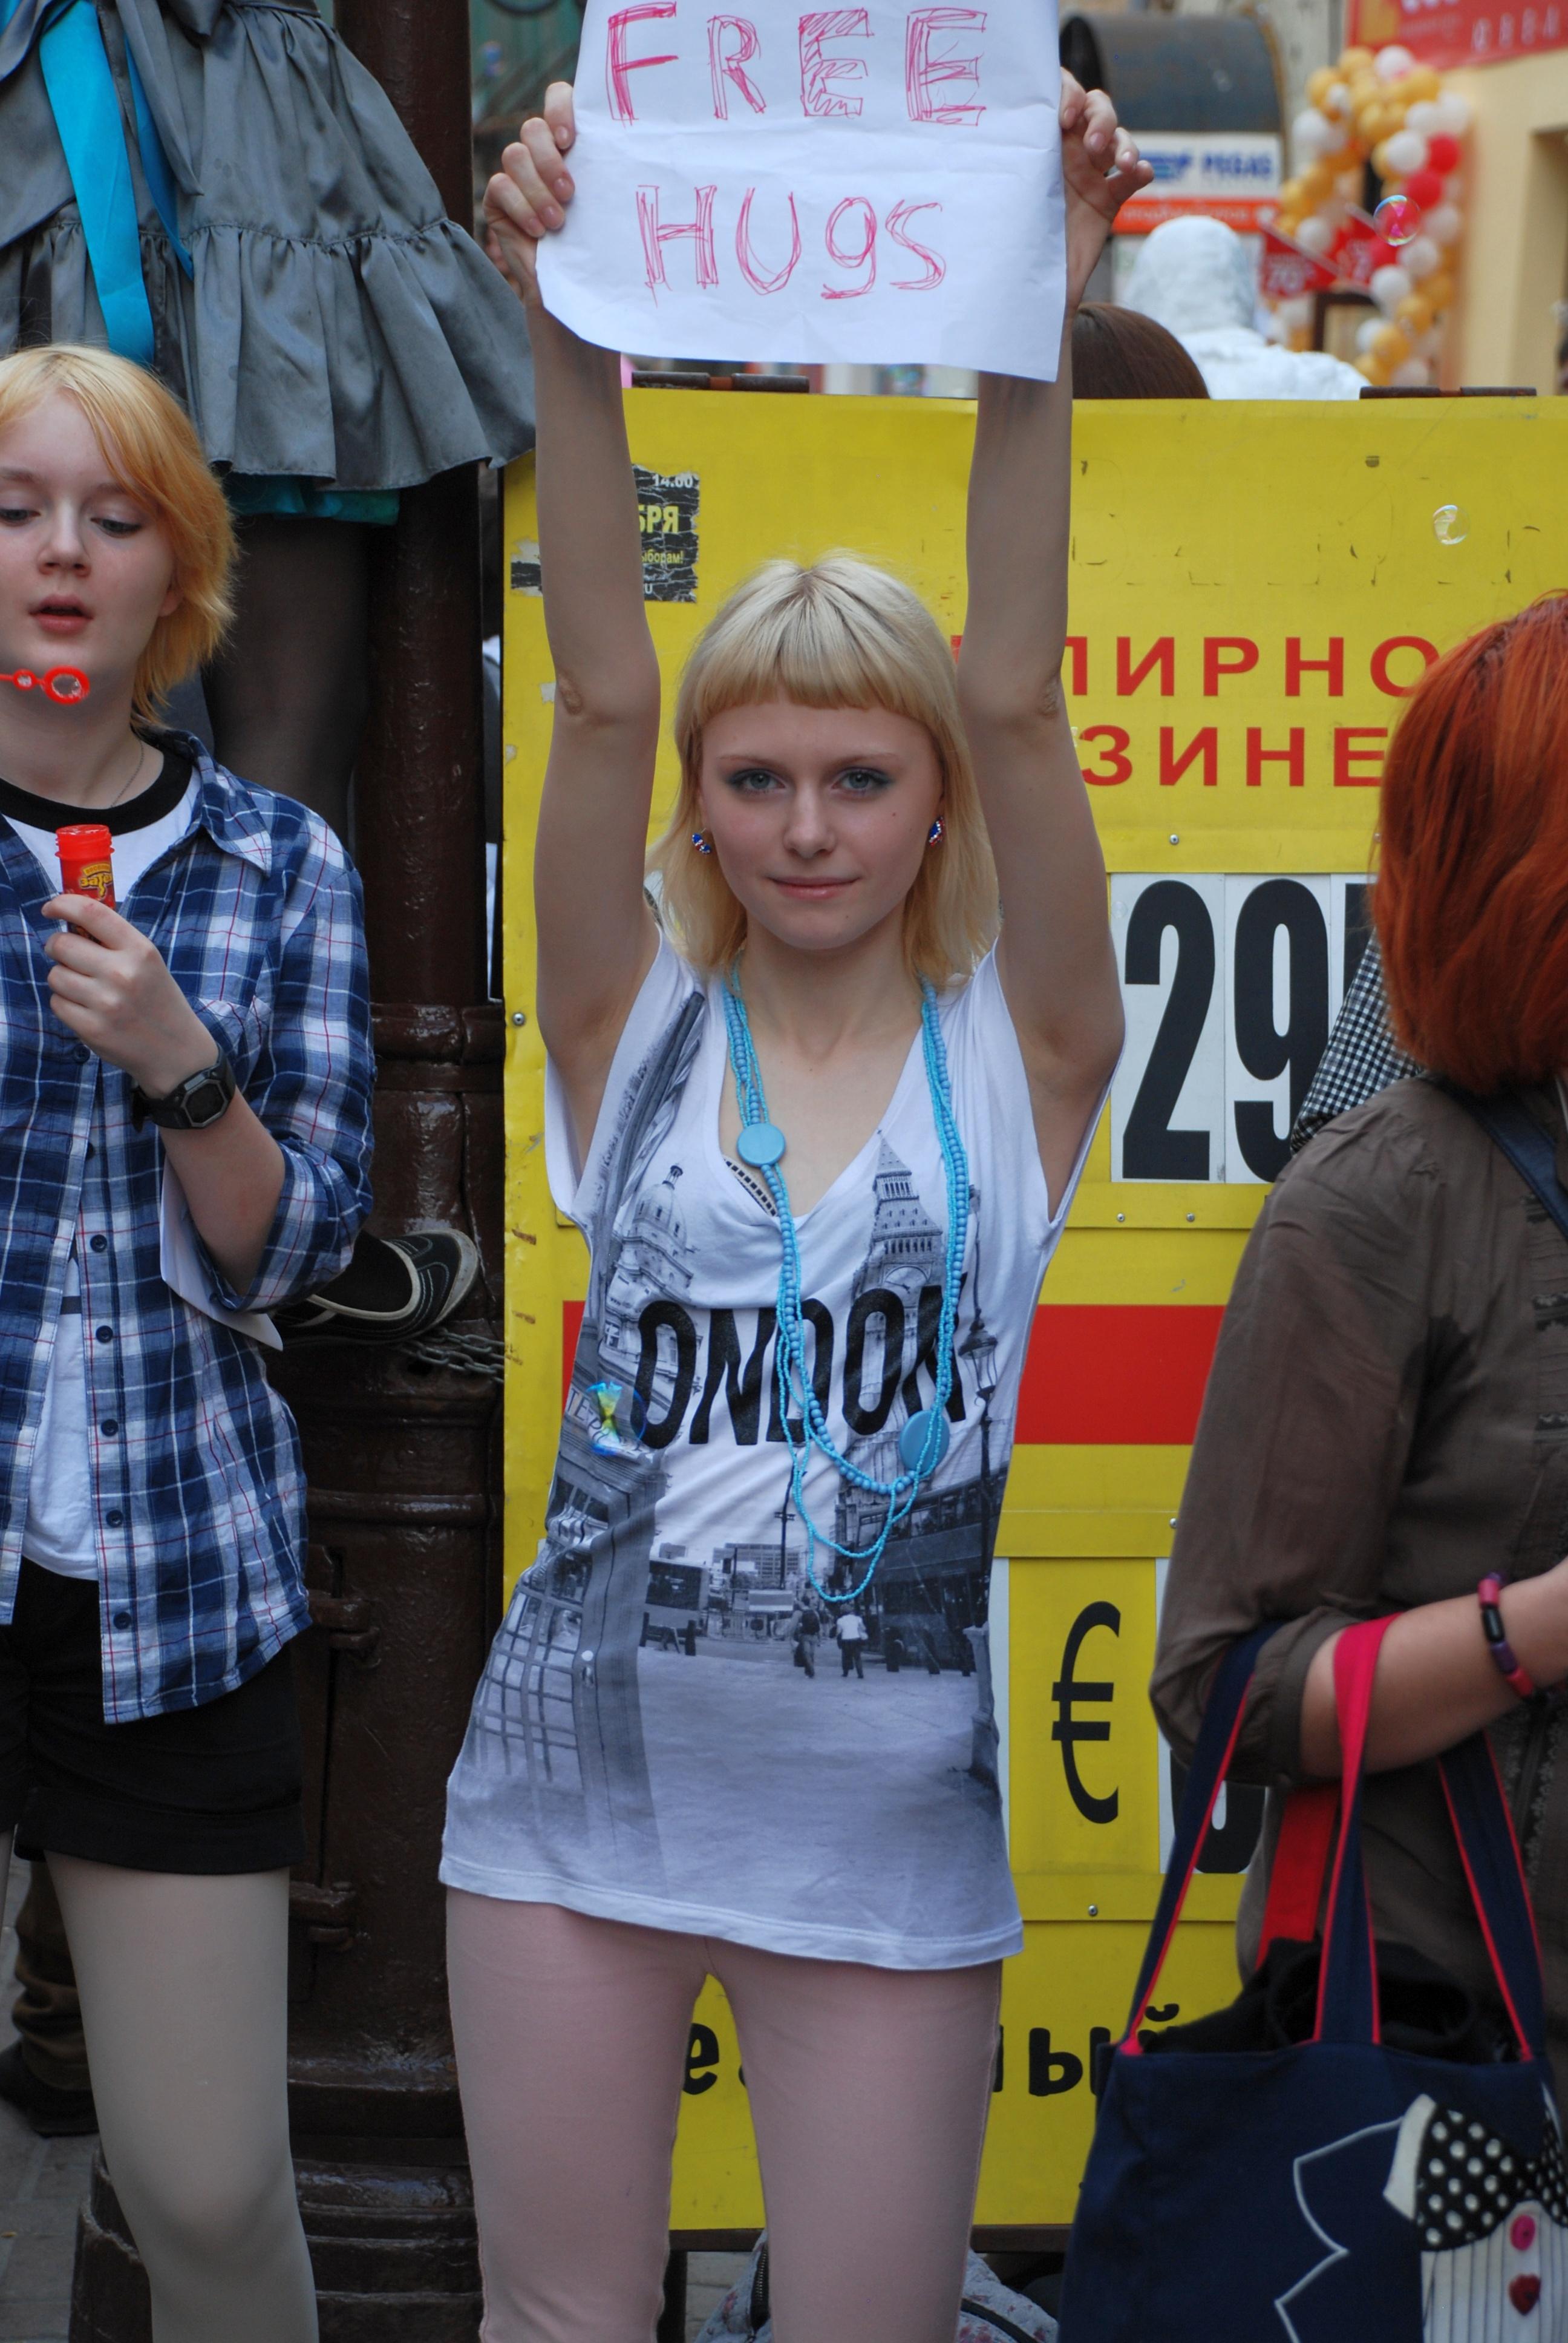 free images : people, girl, woman, street, nikon, clothing, lady